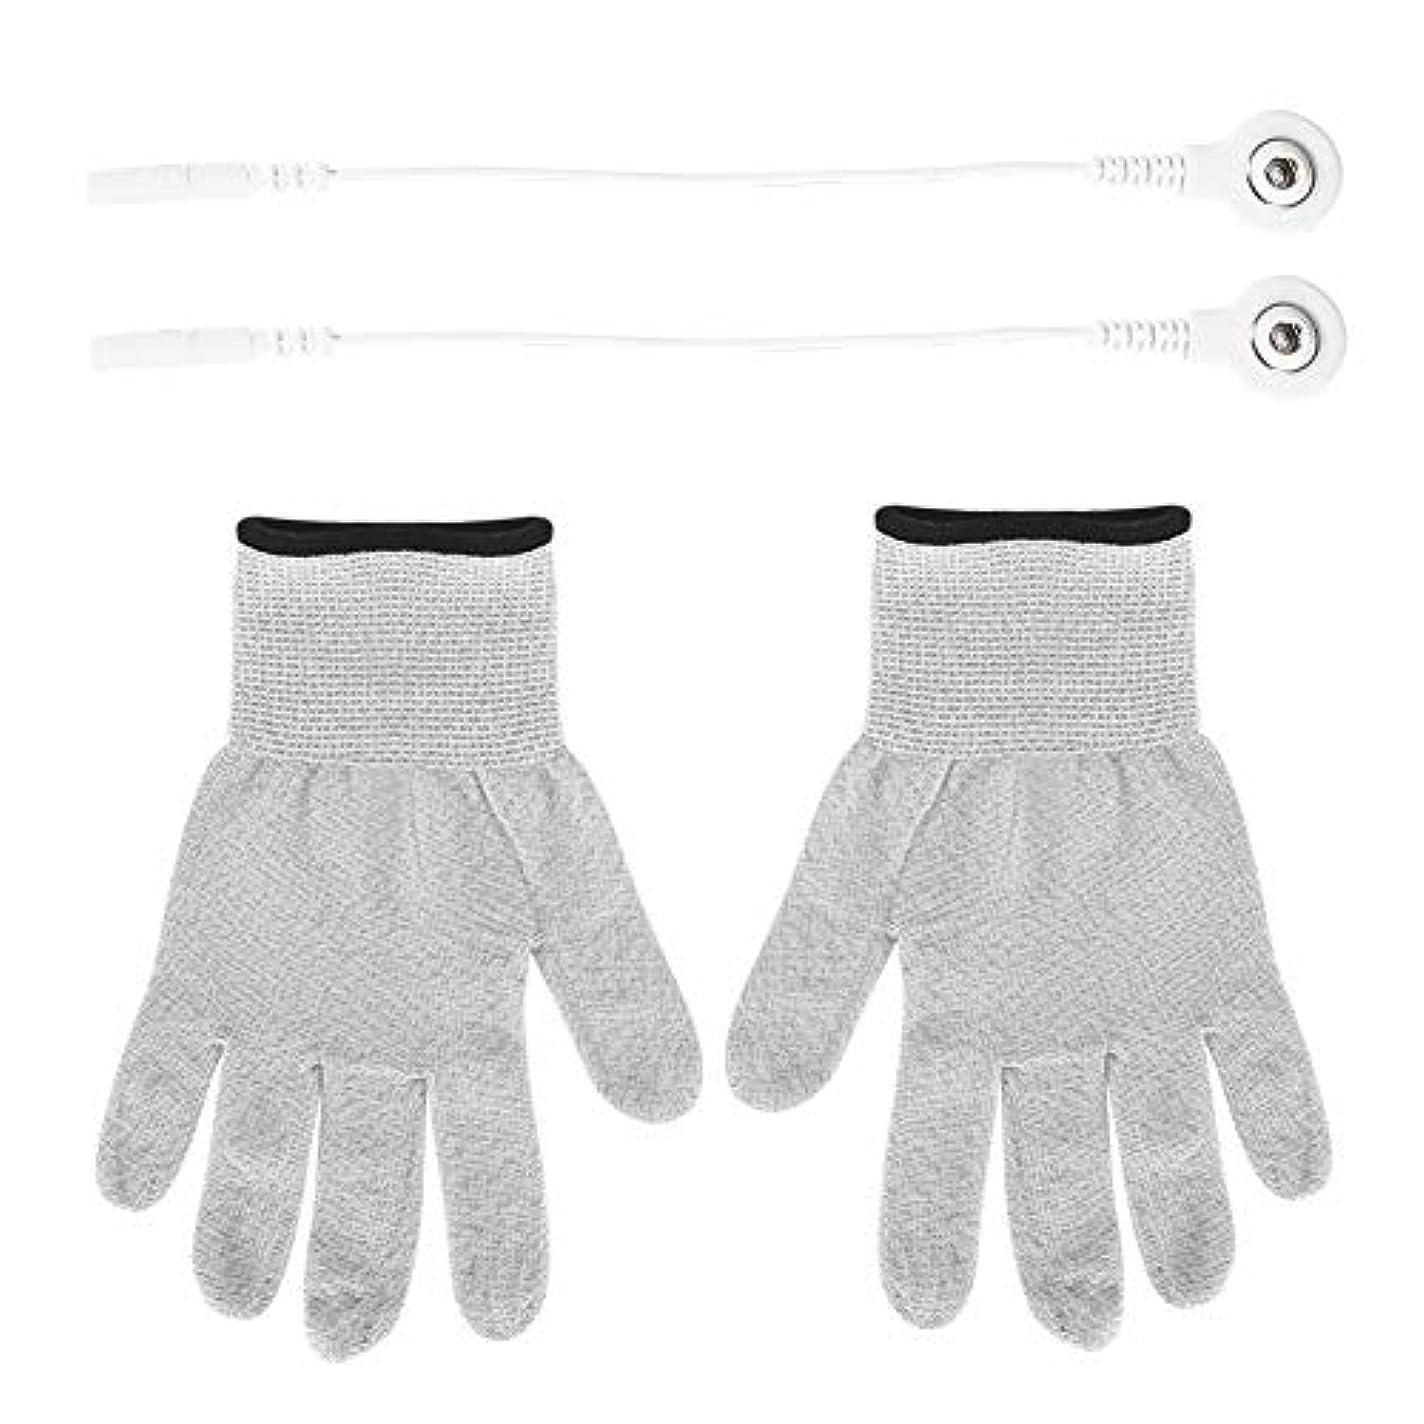 液体リーク神経衰弱1組 電極 手袋繊維 電気衝撃療法 マッサージ 手袋電気衝撃繊維 脈拍療法 マッサージ 伝導性 手袋